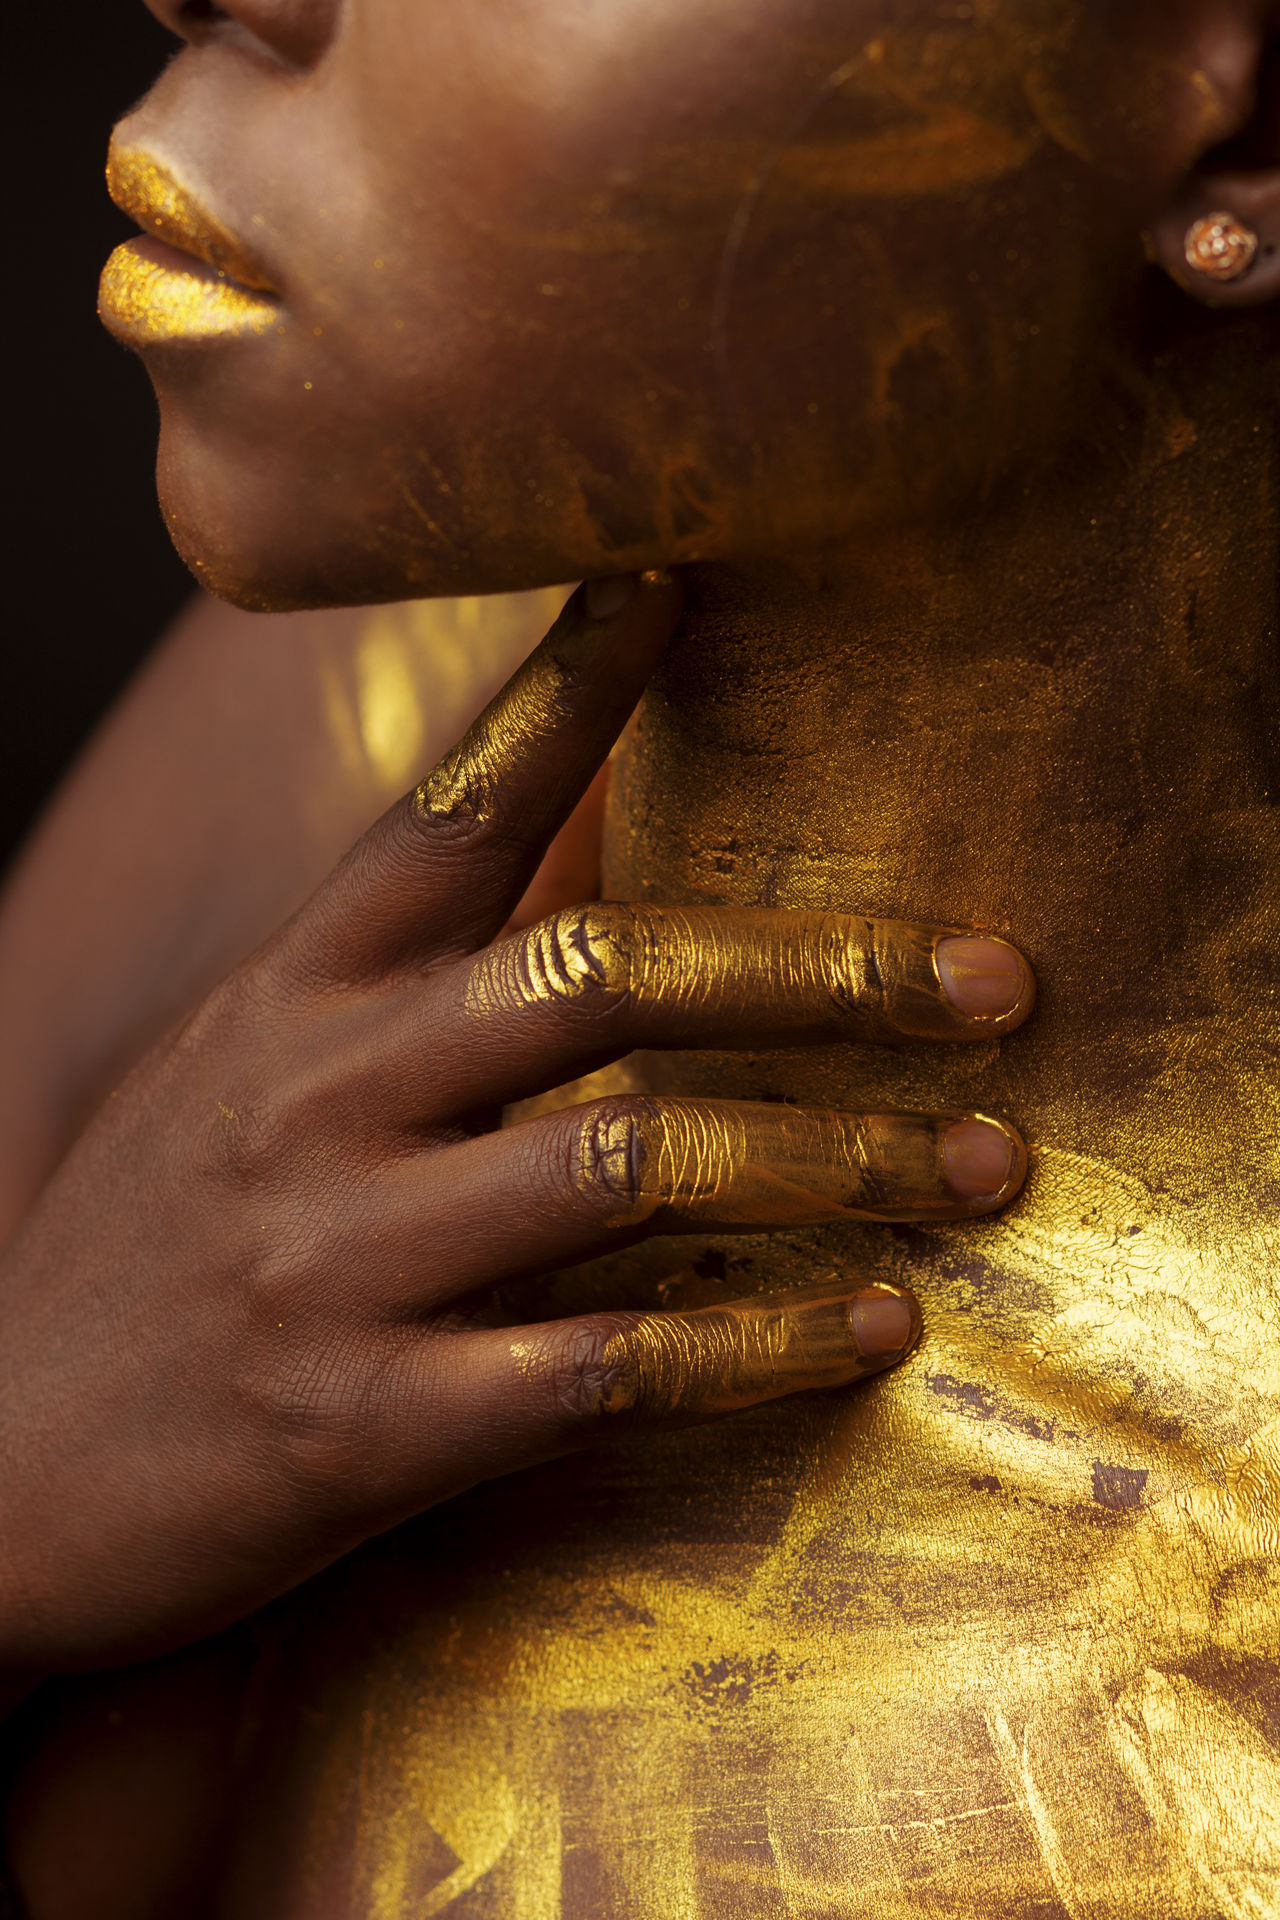 Close-up Gold Golden Human Body Part Human Hand Jewelry Paint Religion Spirituality Studio Studio Photography Studio Shot